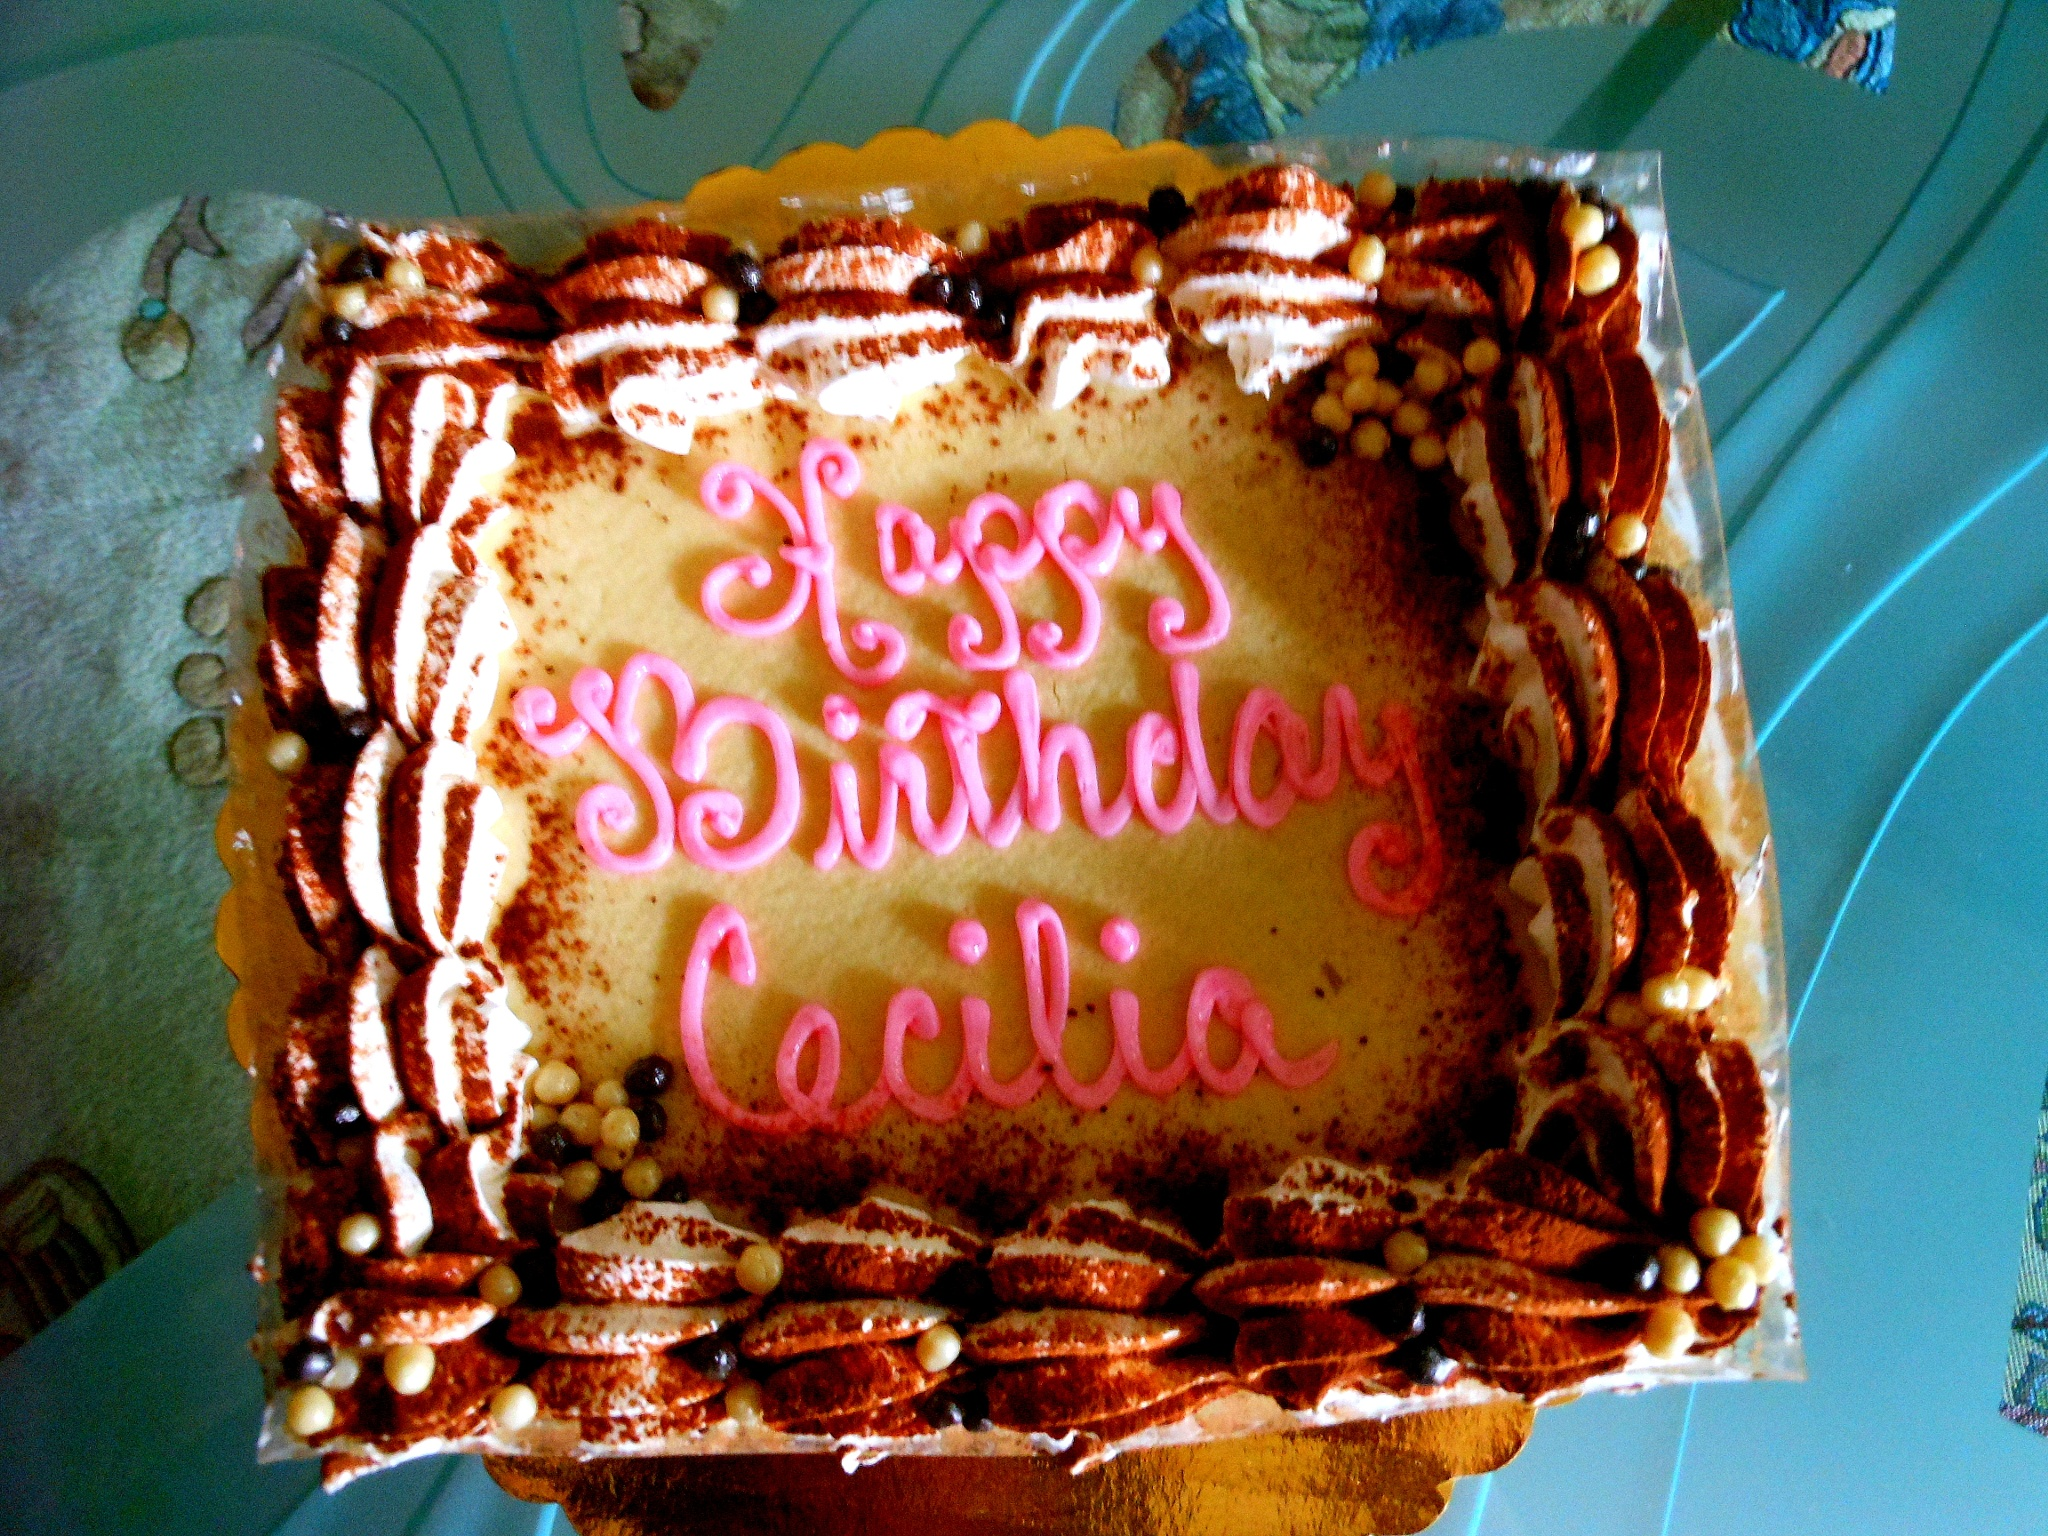 Mom's Birthday Cake  by Hwang1970